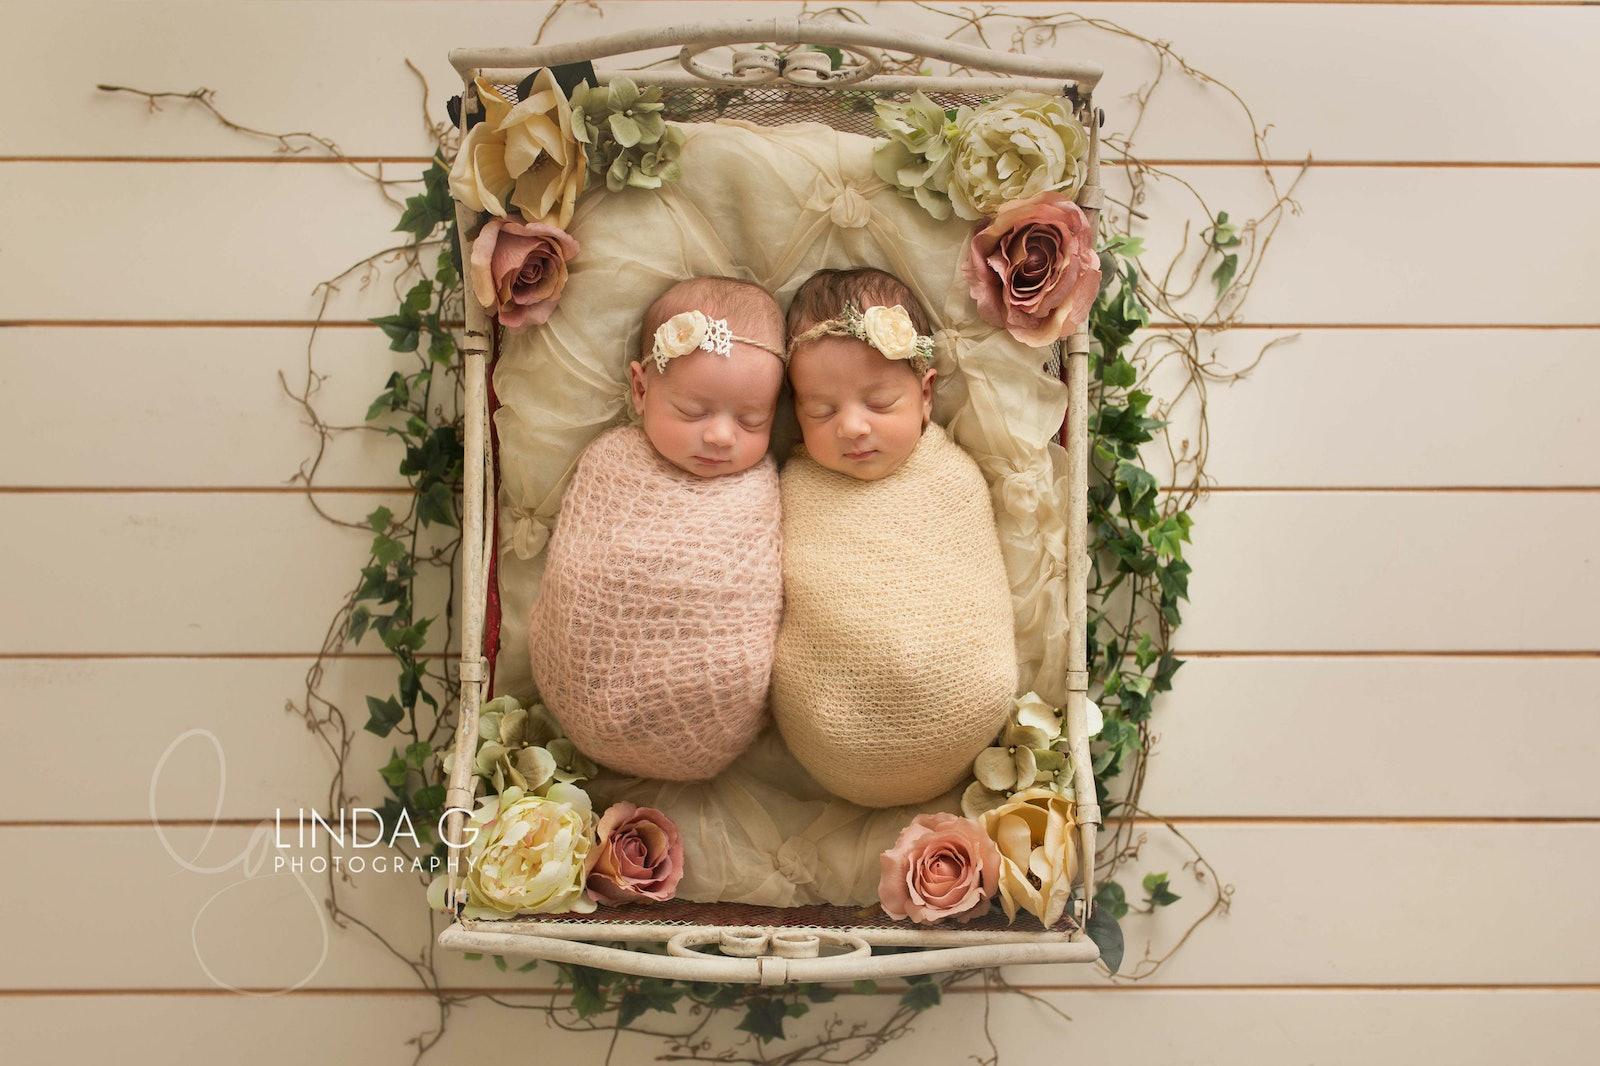 Linda G Photography twins 5